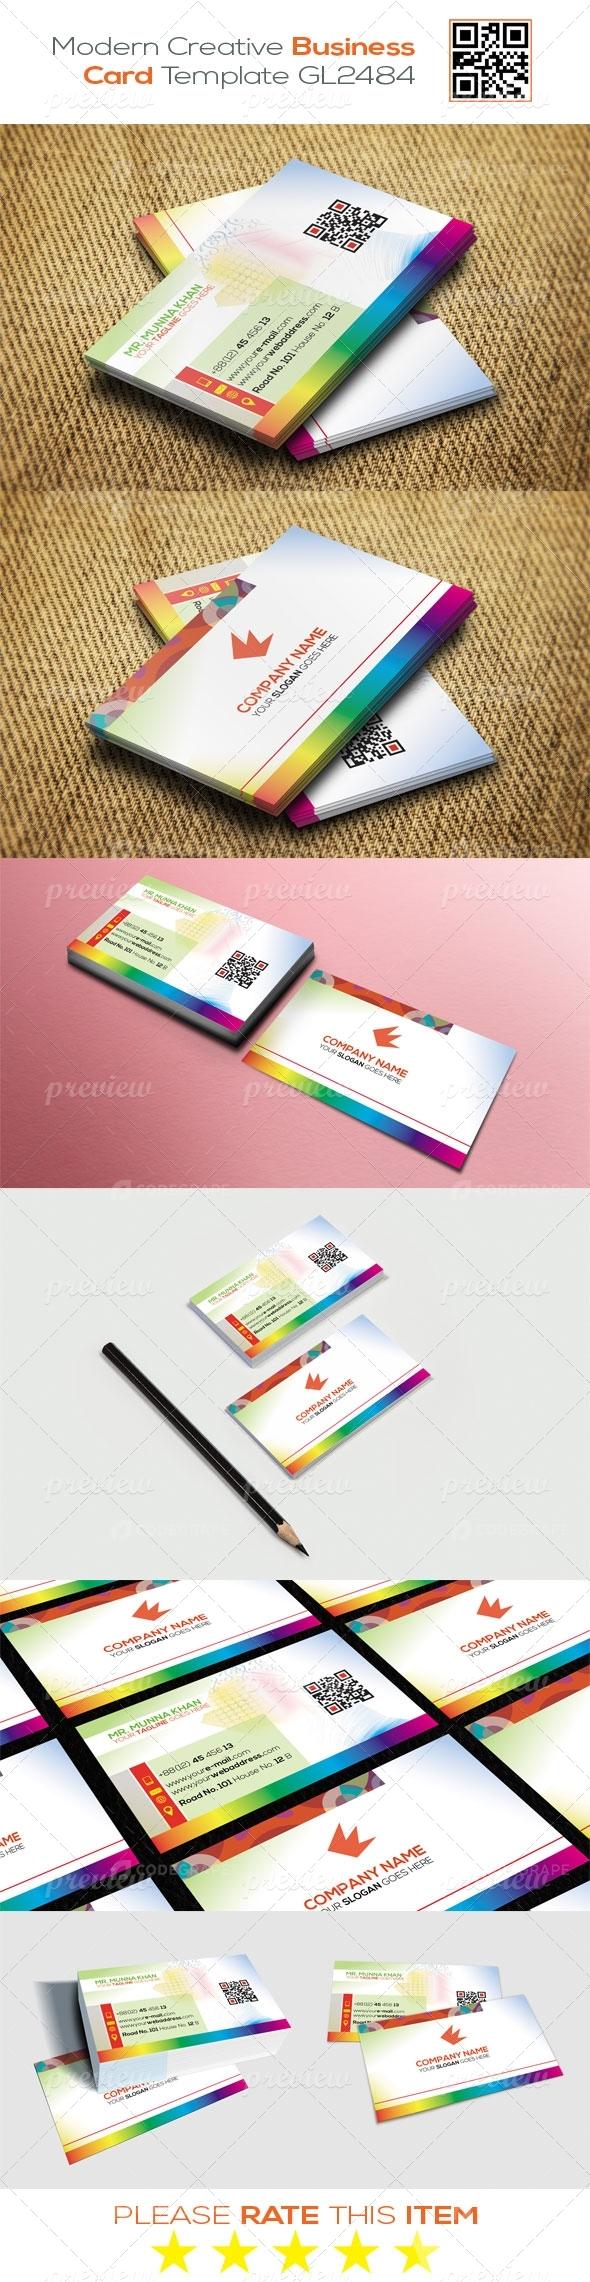 Modern Creative Business Card Template GL2484